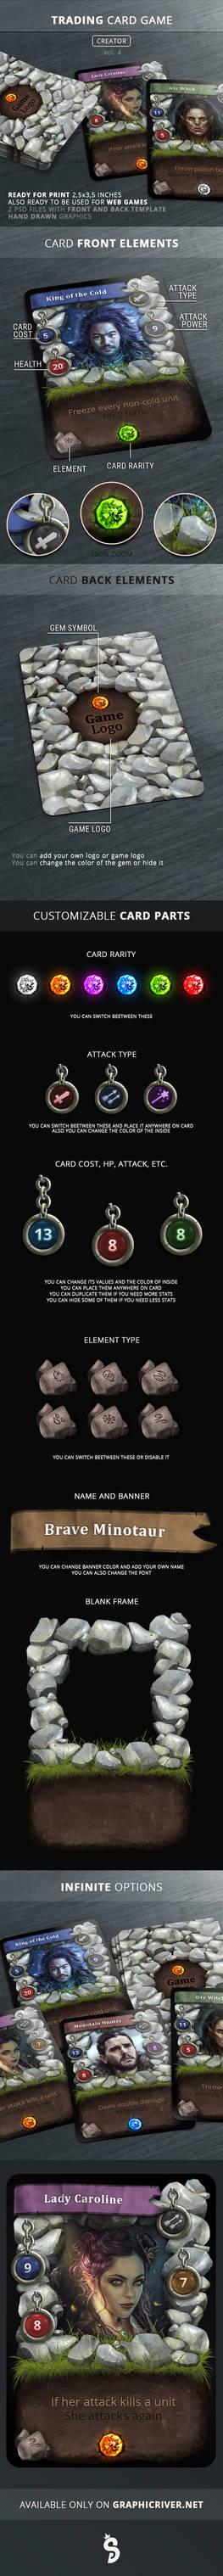 Trading Card Game - Creator - vol.4